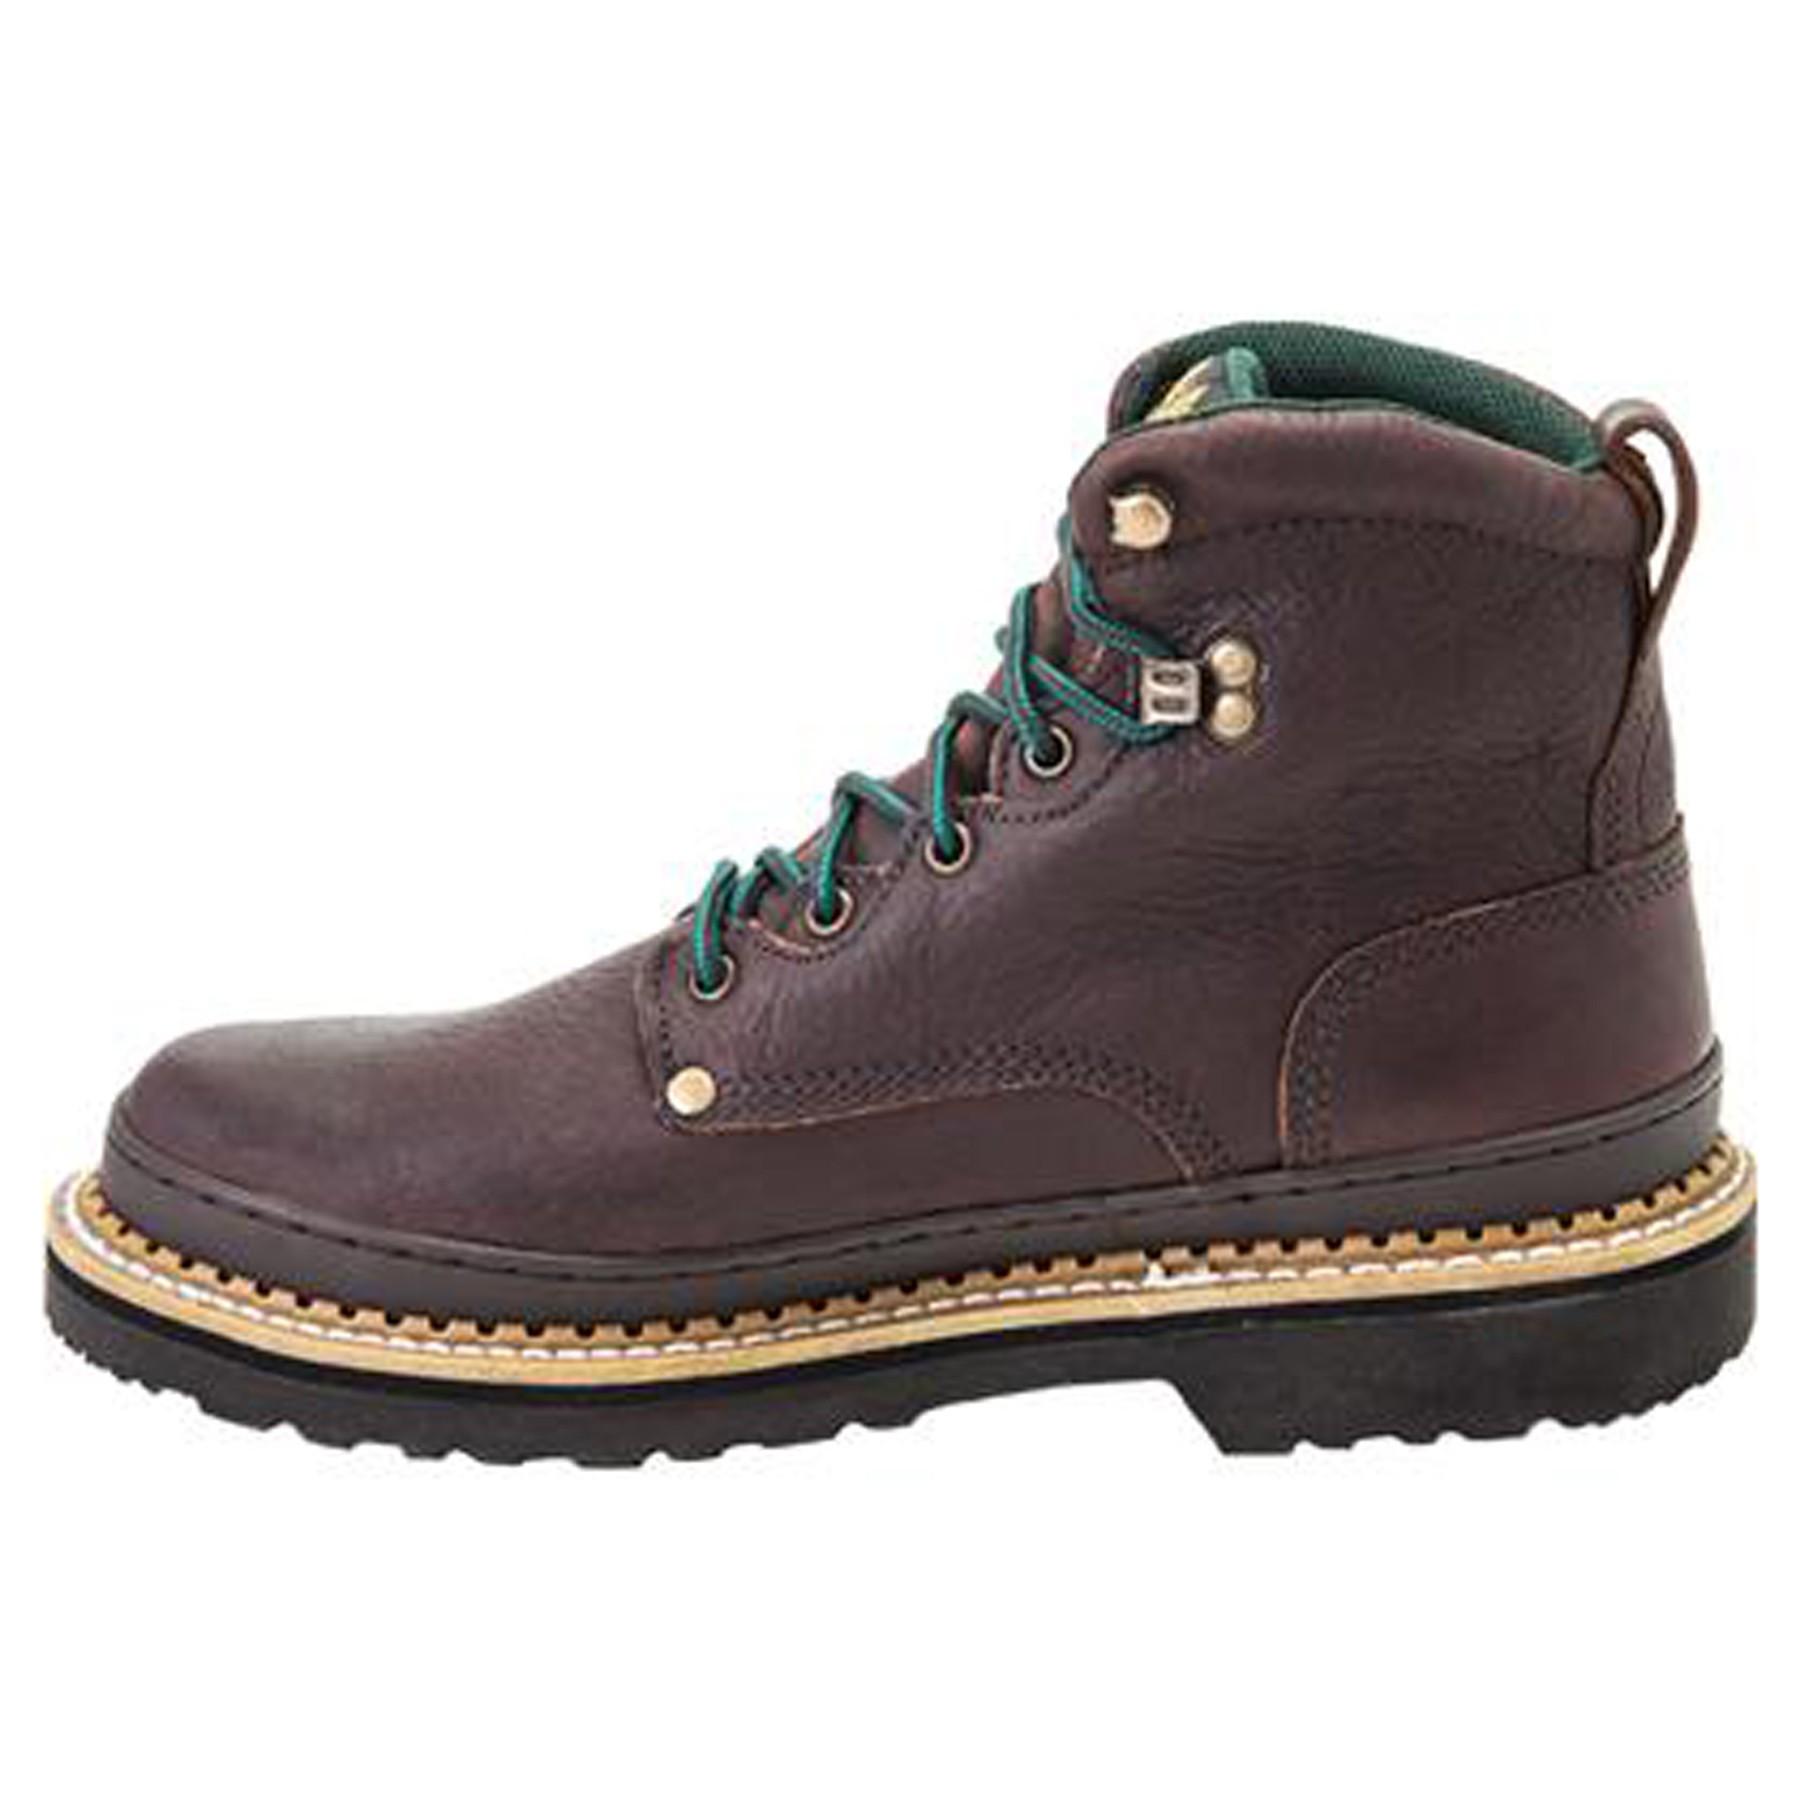 Few common info on women's work boots